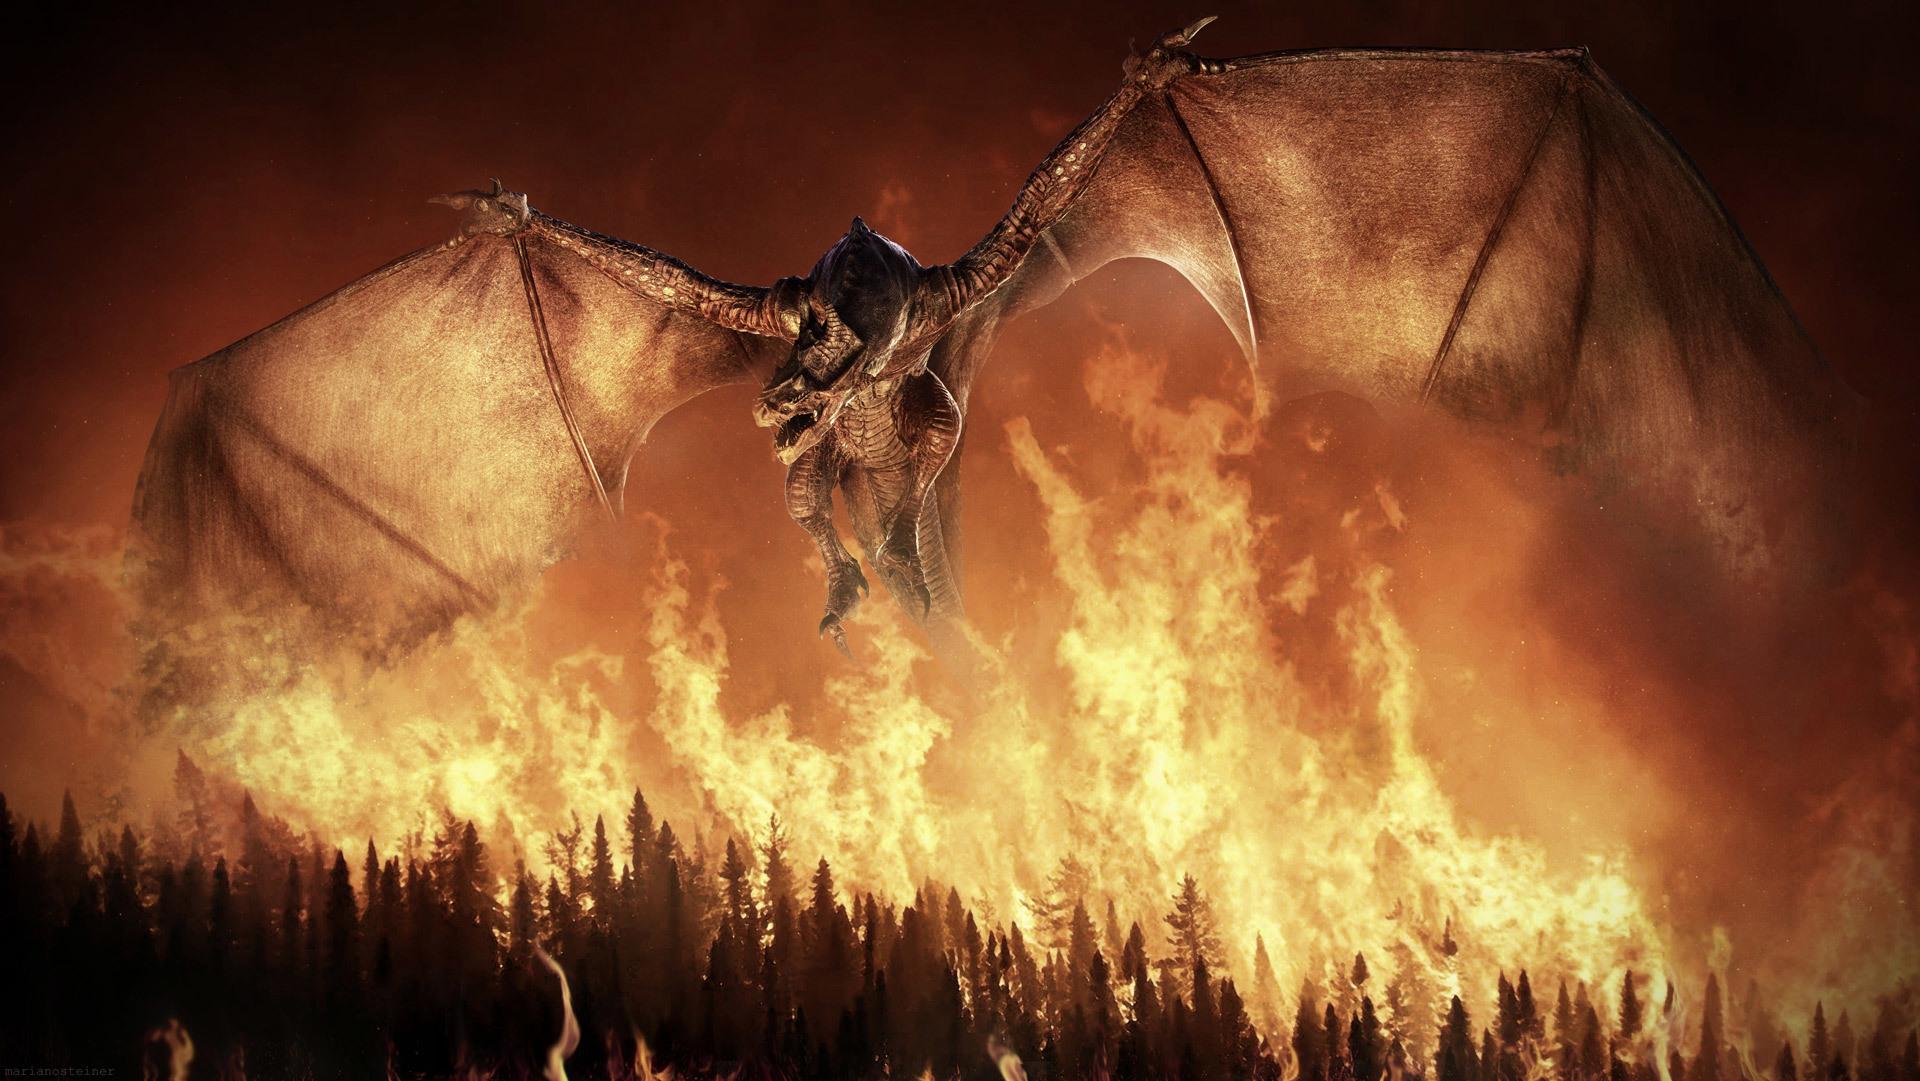 Wings of Fire Wallpaper - WallpaperSafari Fire And Ice Dragon Wallpaper